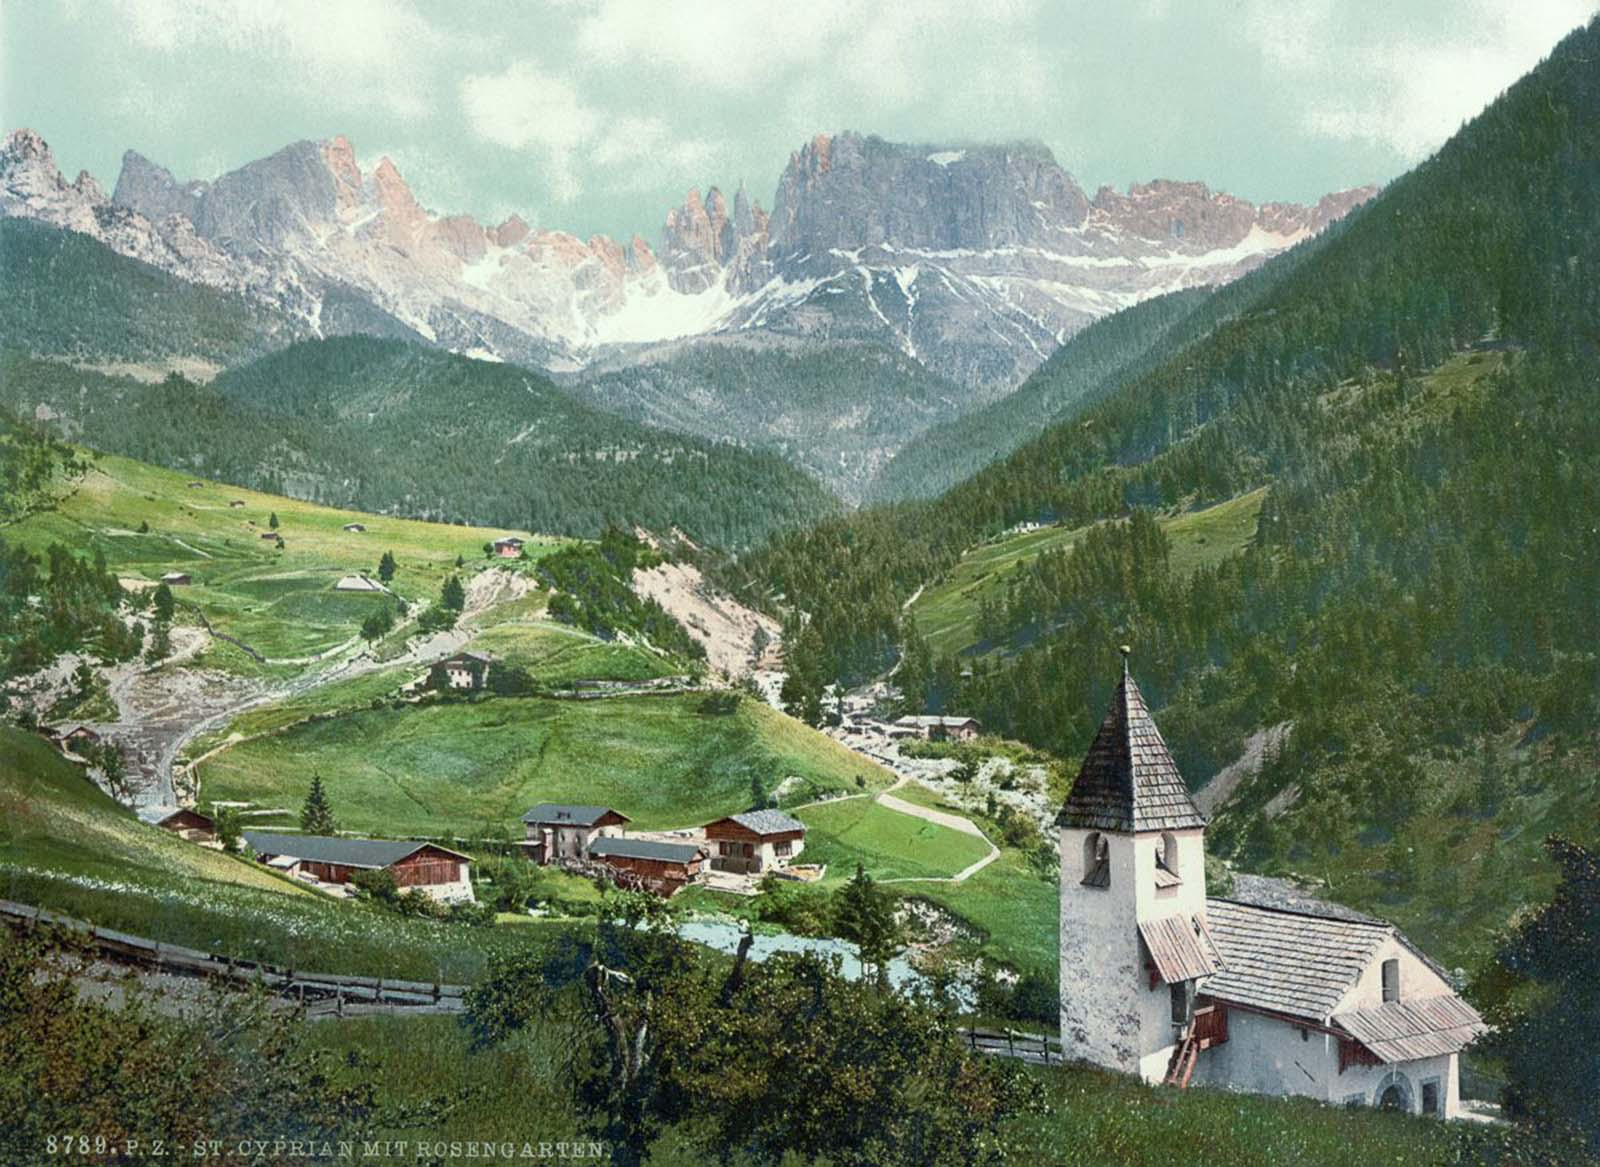 Rosengarten and St. Cyprian